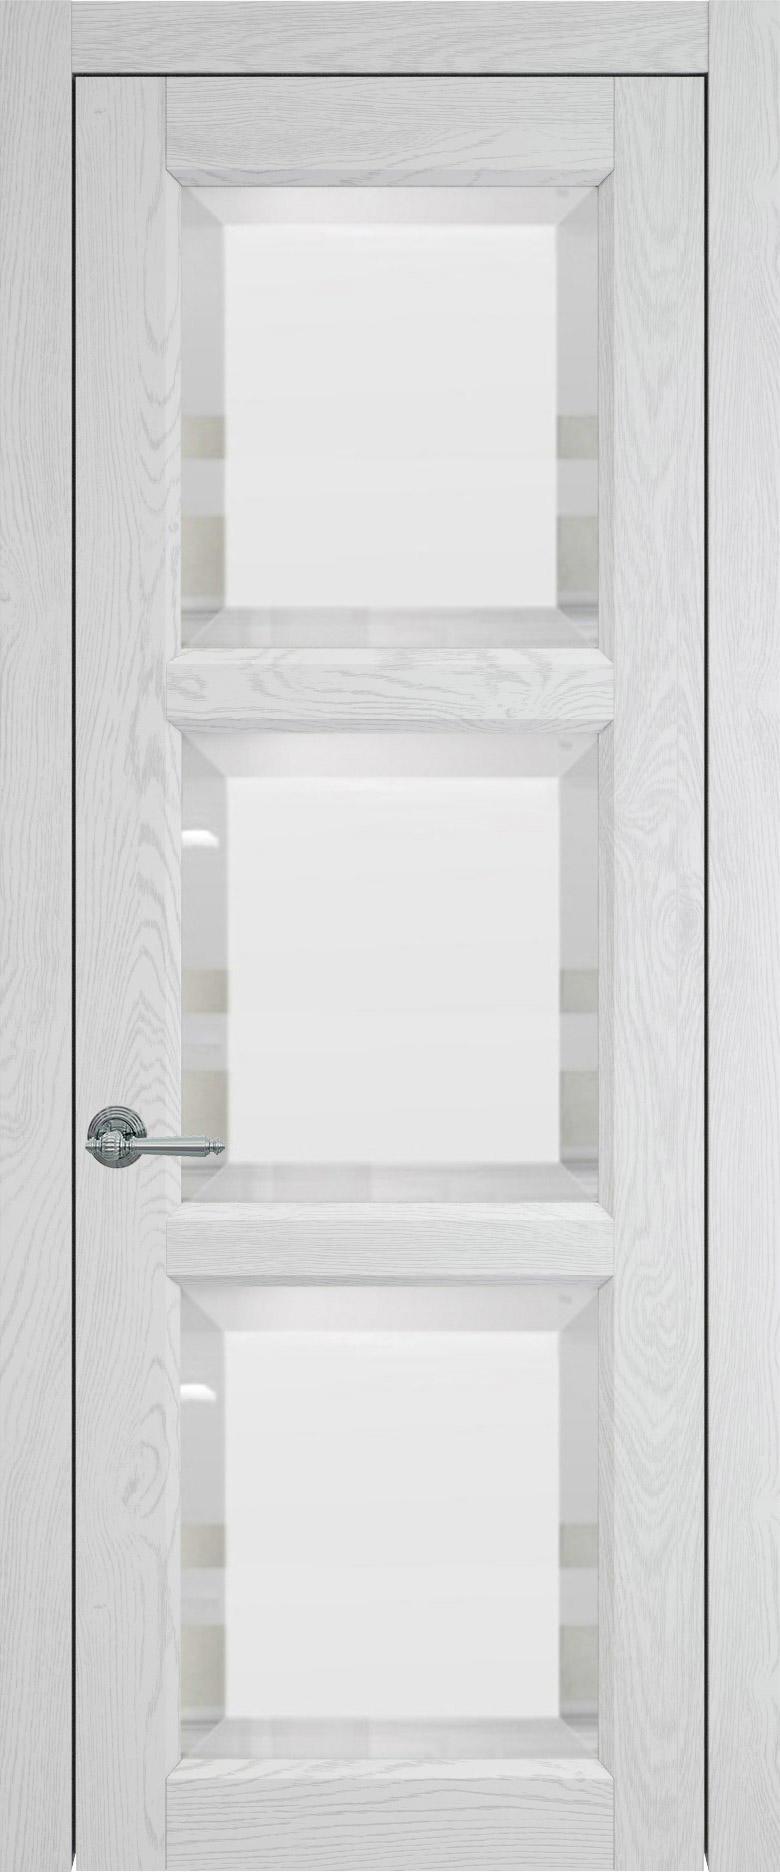 Milano цвет - Белый ясень (шпон) Со стеклом (ДО)